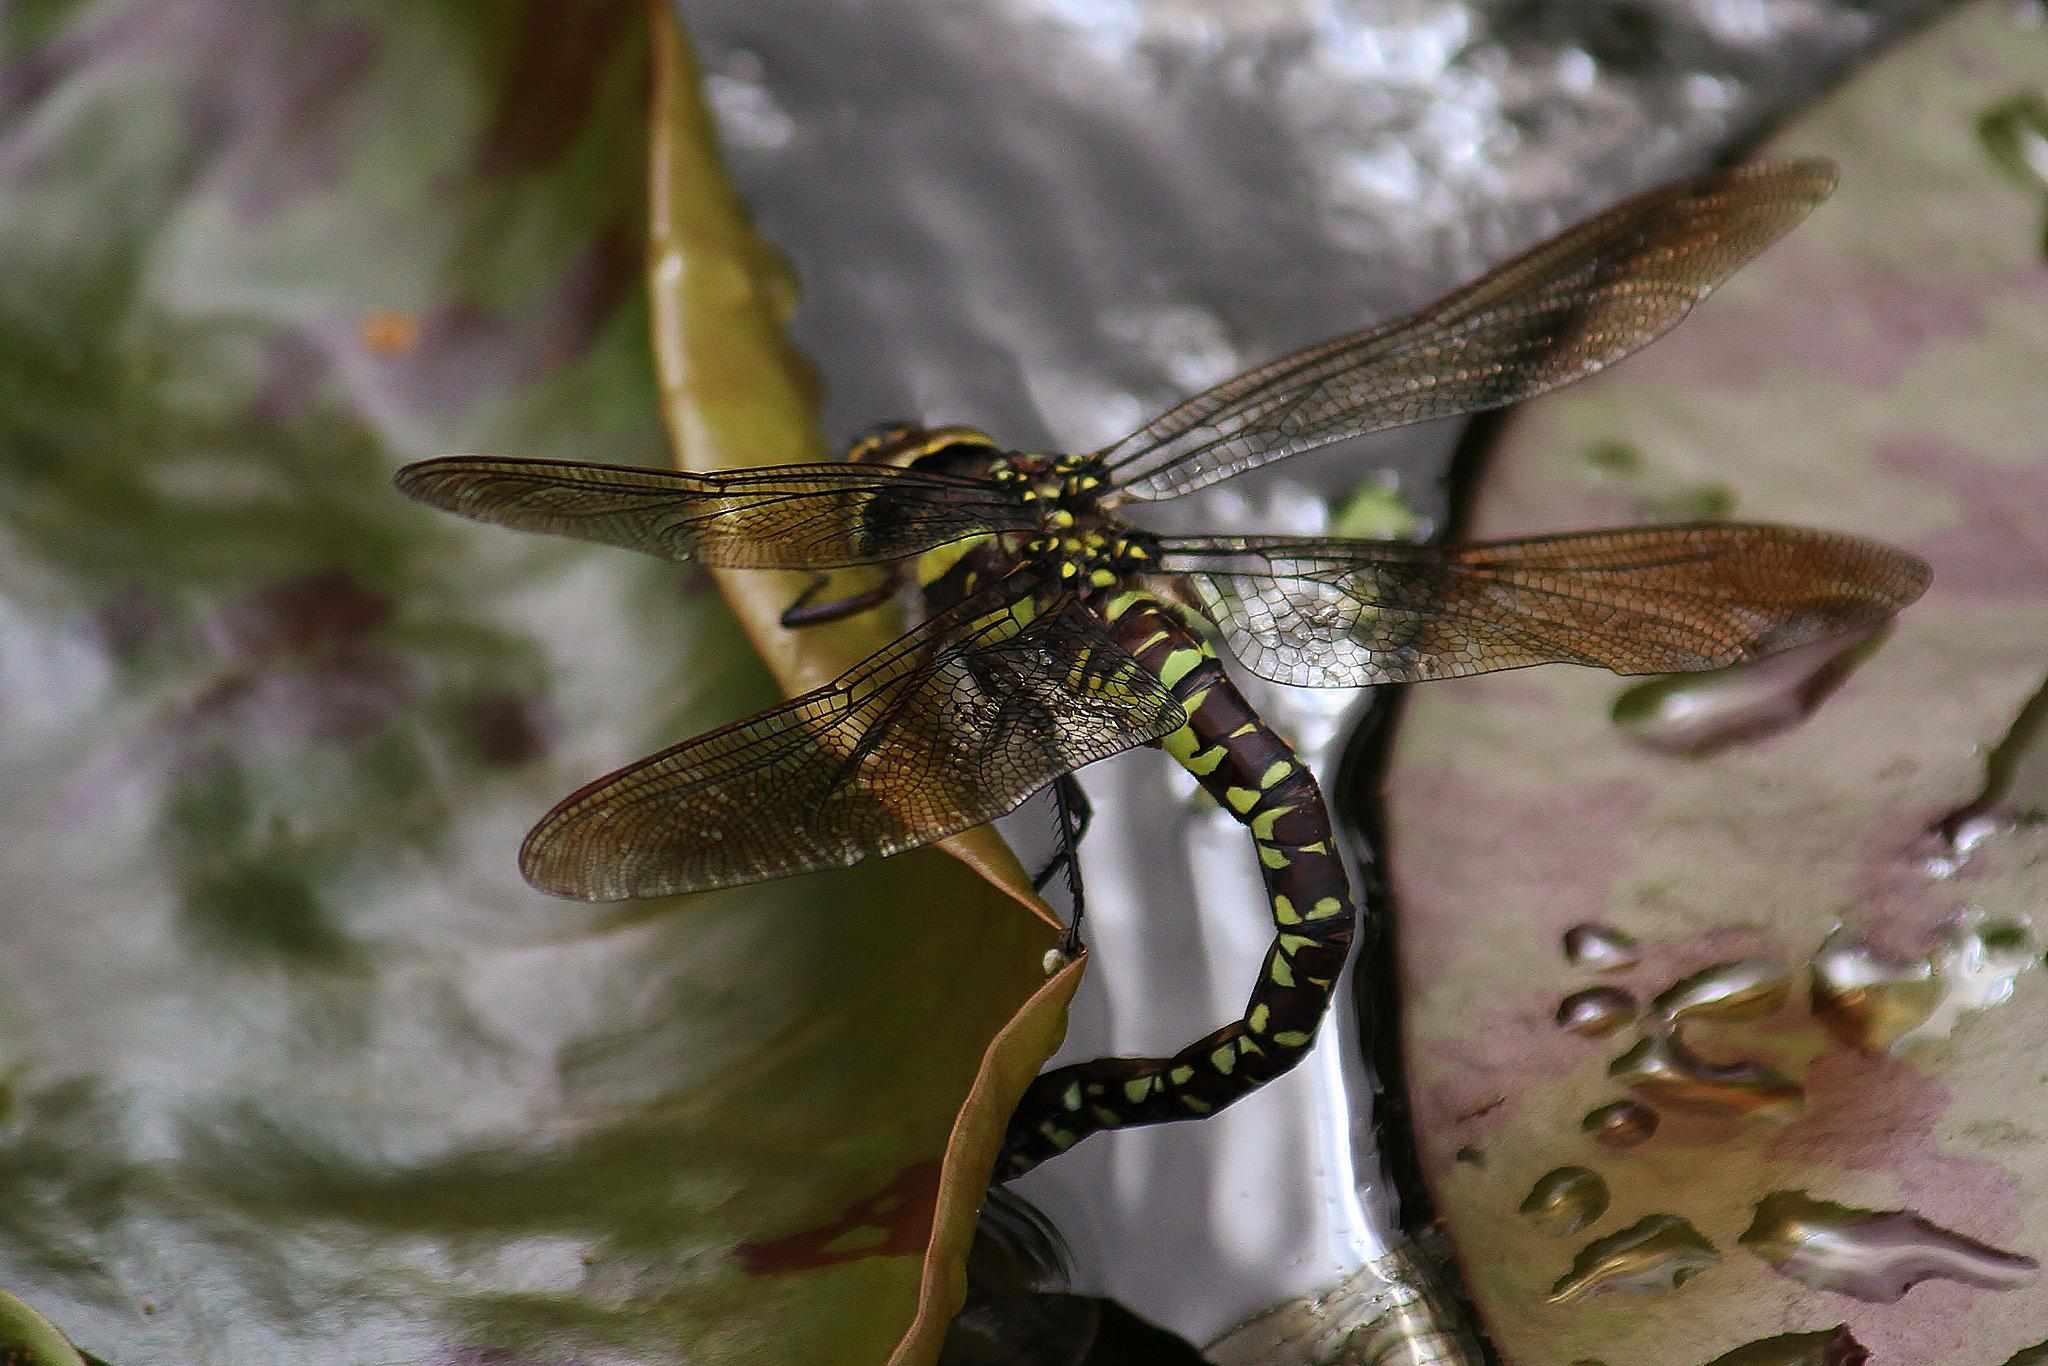 A dragonfly depositing eggs in an aquatic plant.